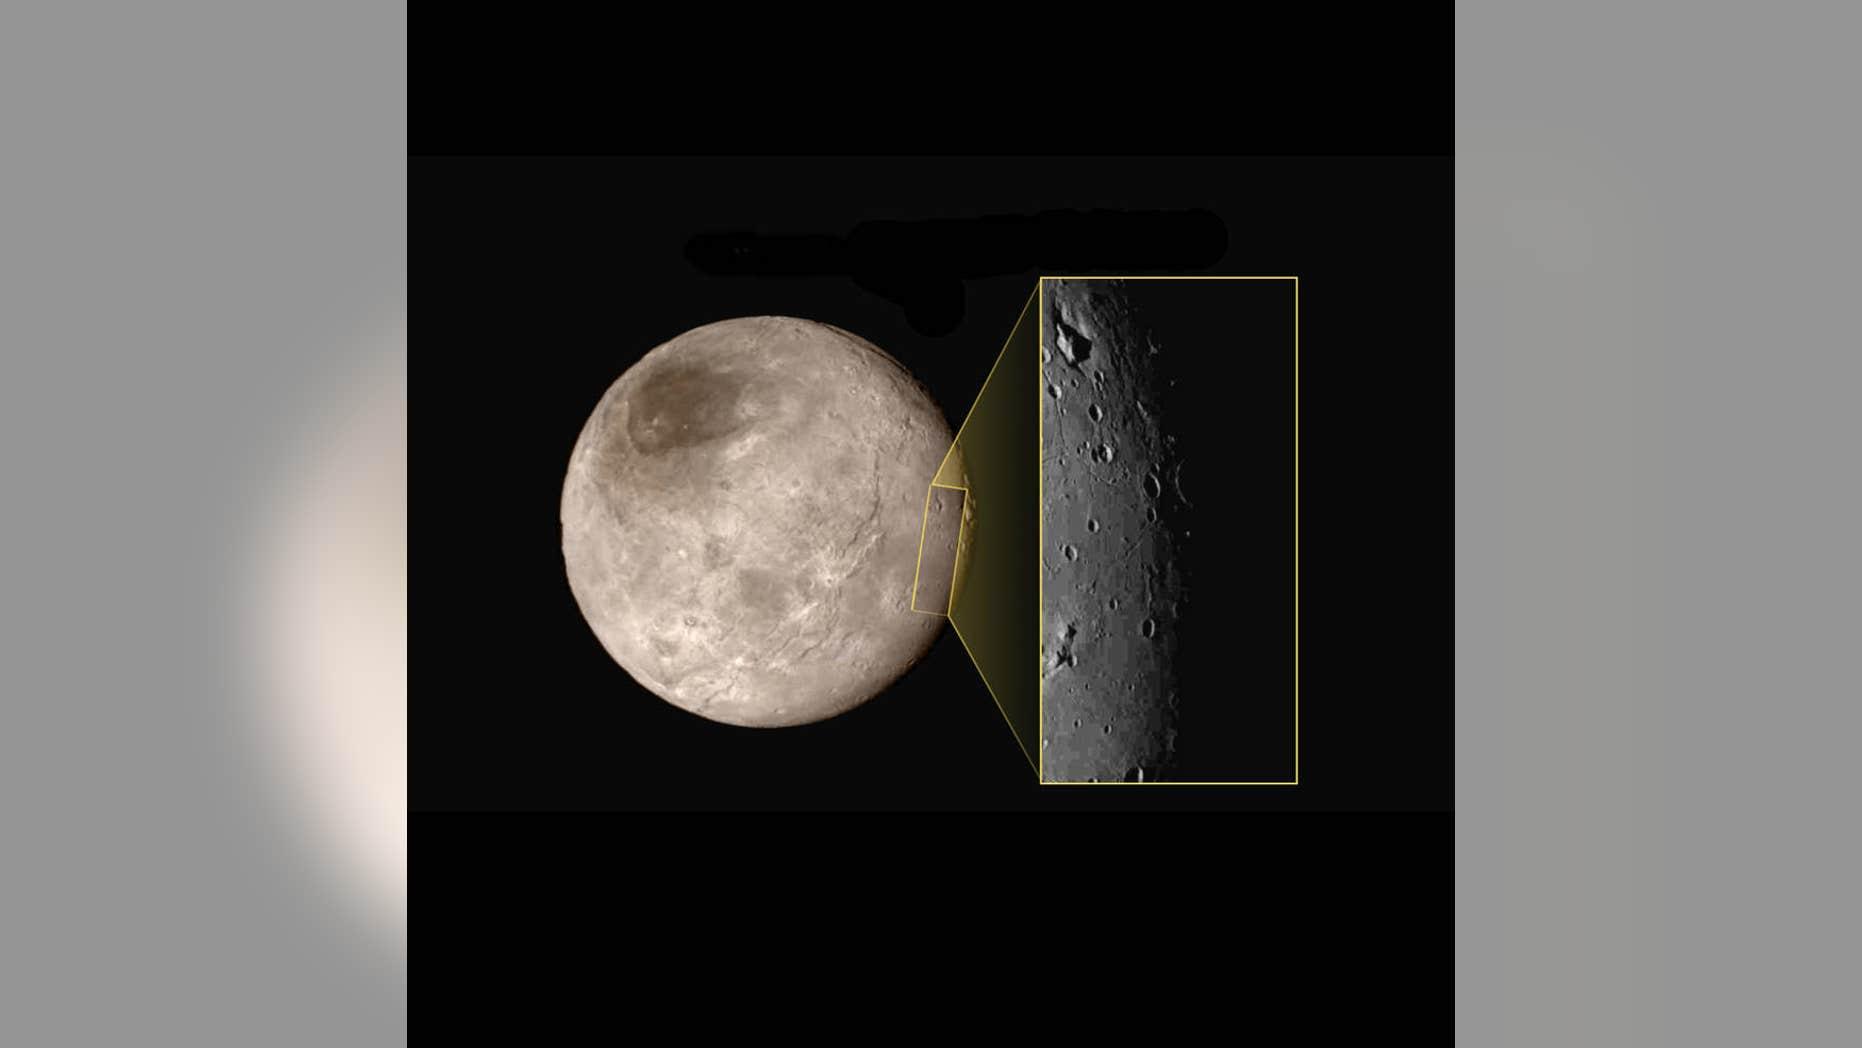 Charon Moon: NASA Releases Closeup Image Of Pluto's Moon Charon